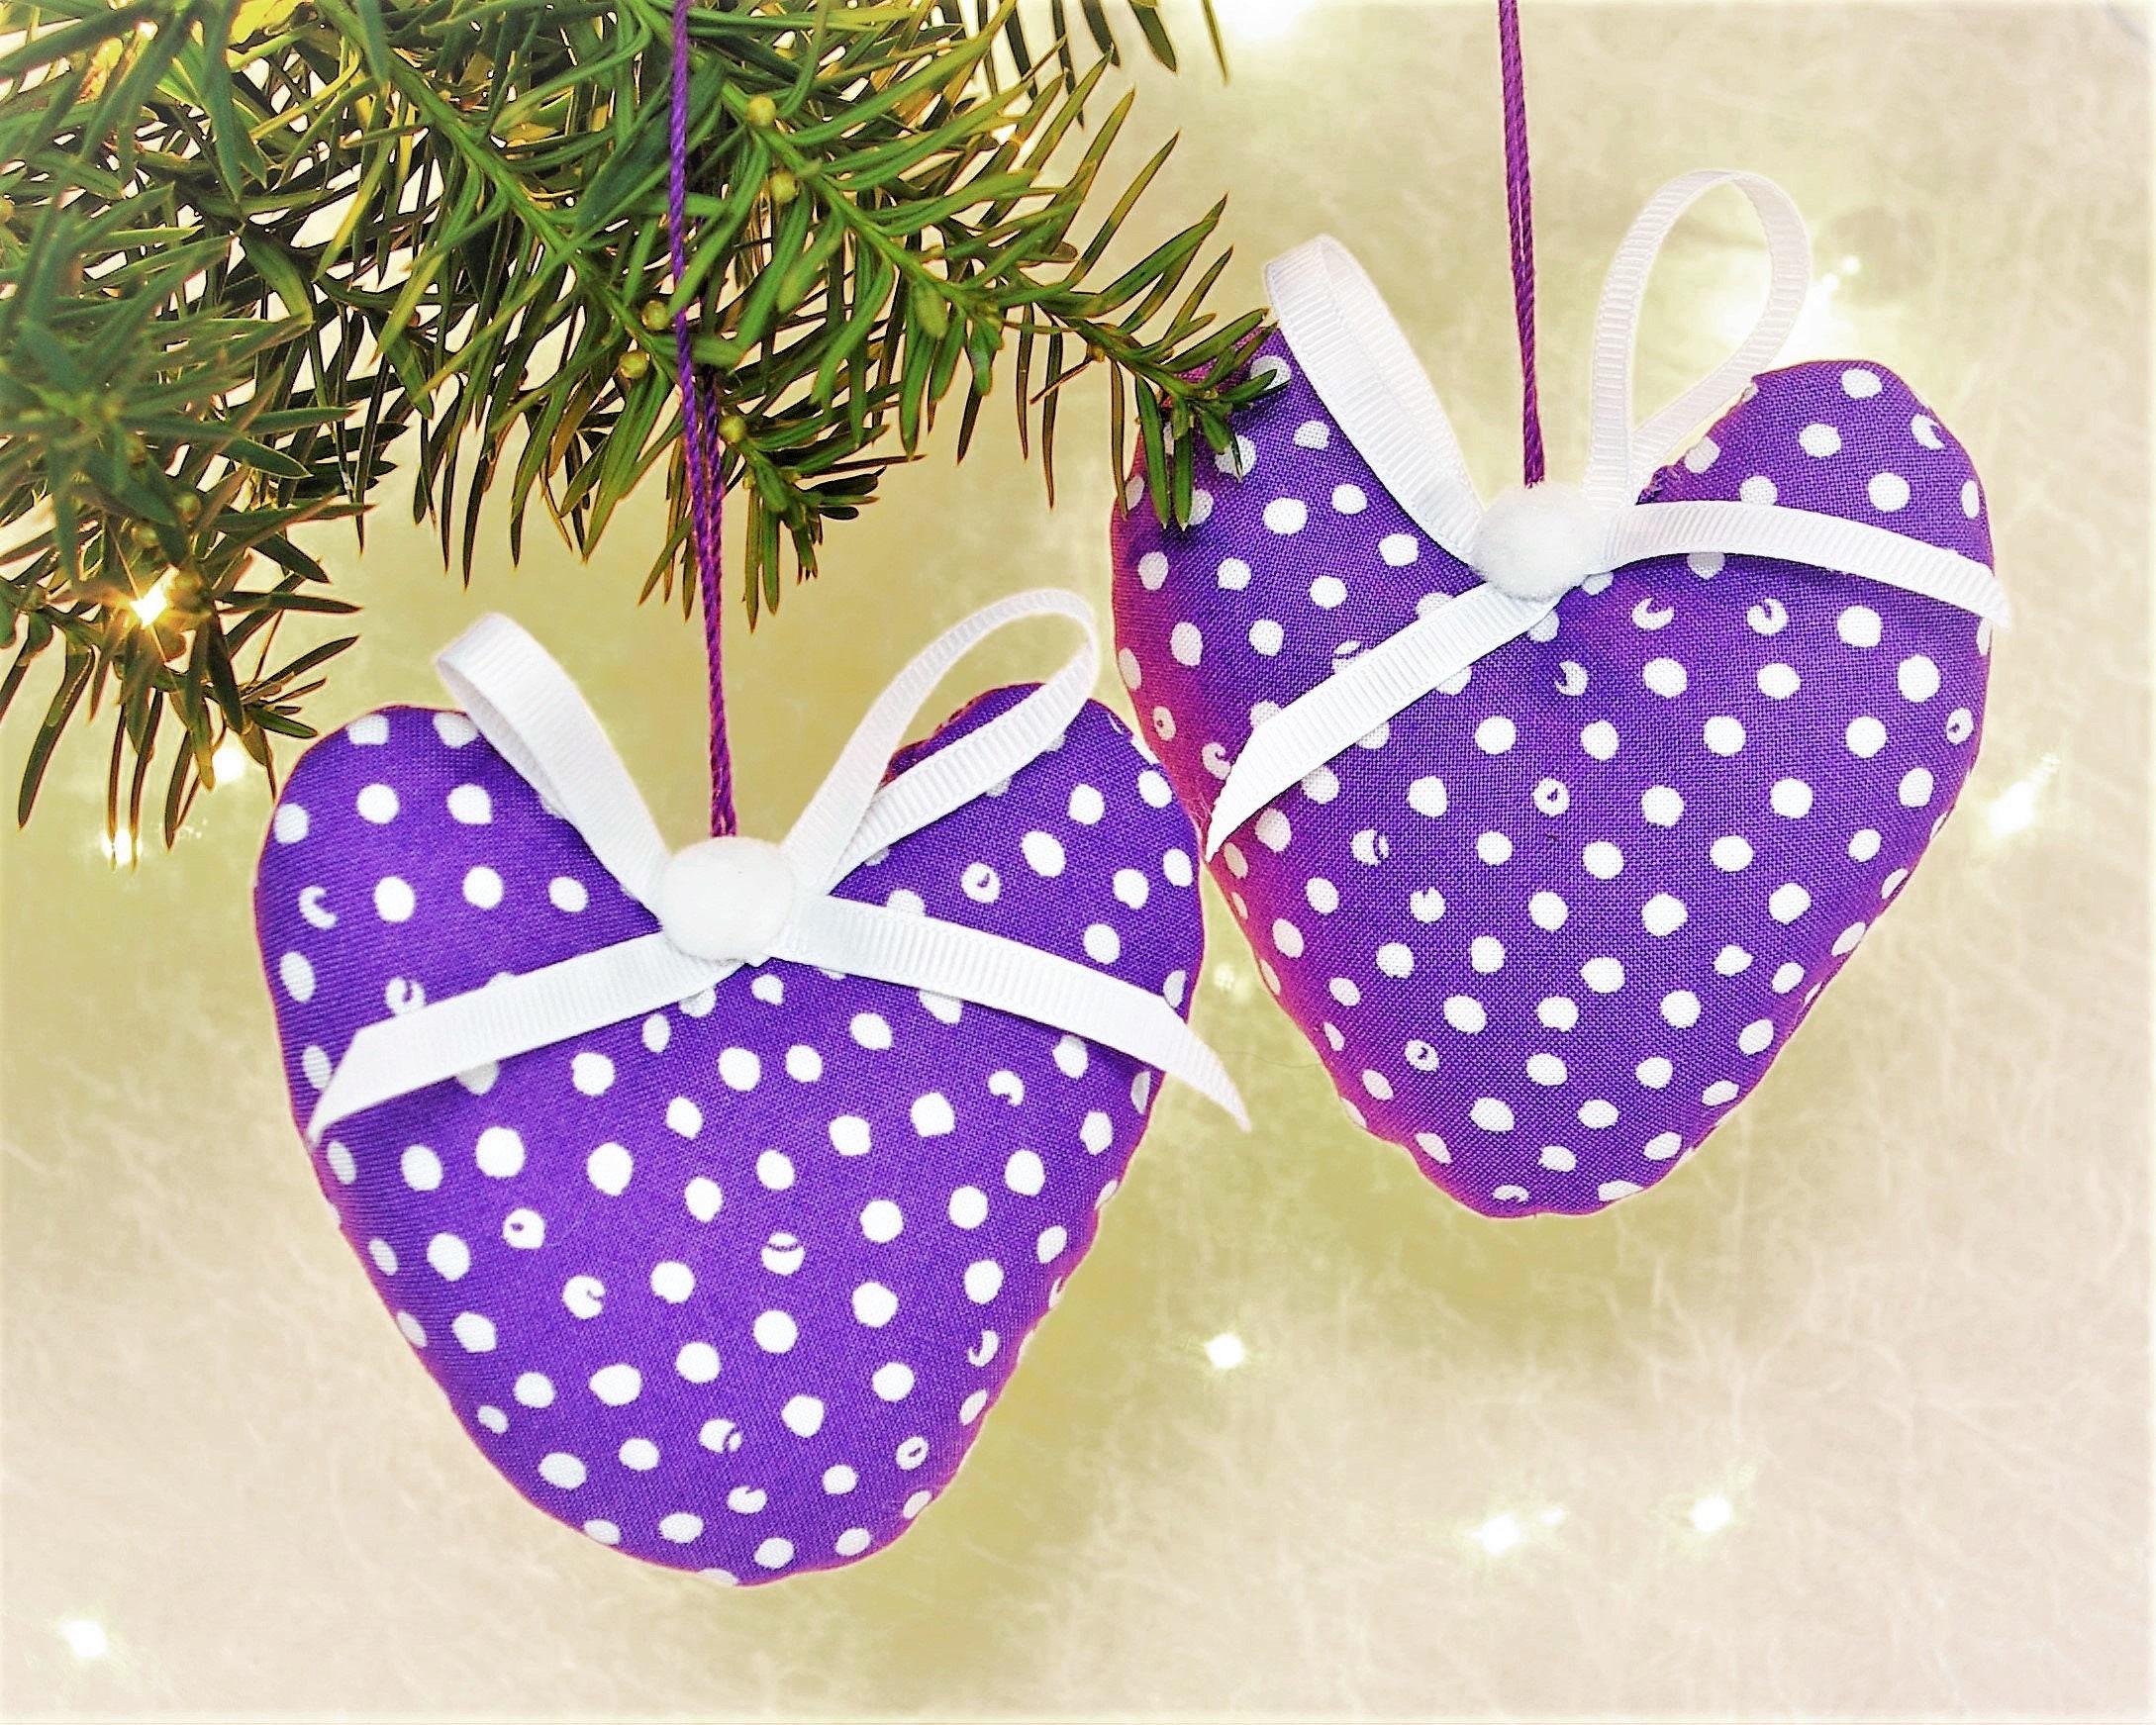 purple heart decorations lilac christmas decorations gallery photo gallery photo gallery photo gallery photo gallery photo